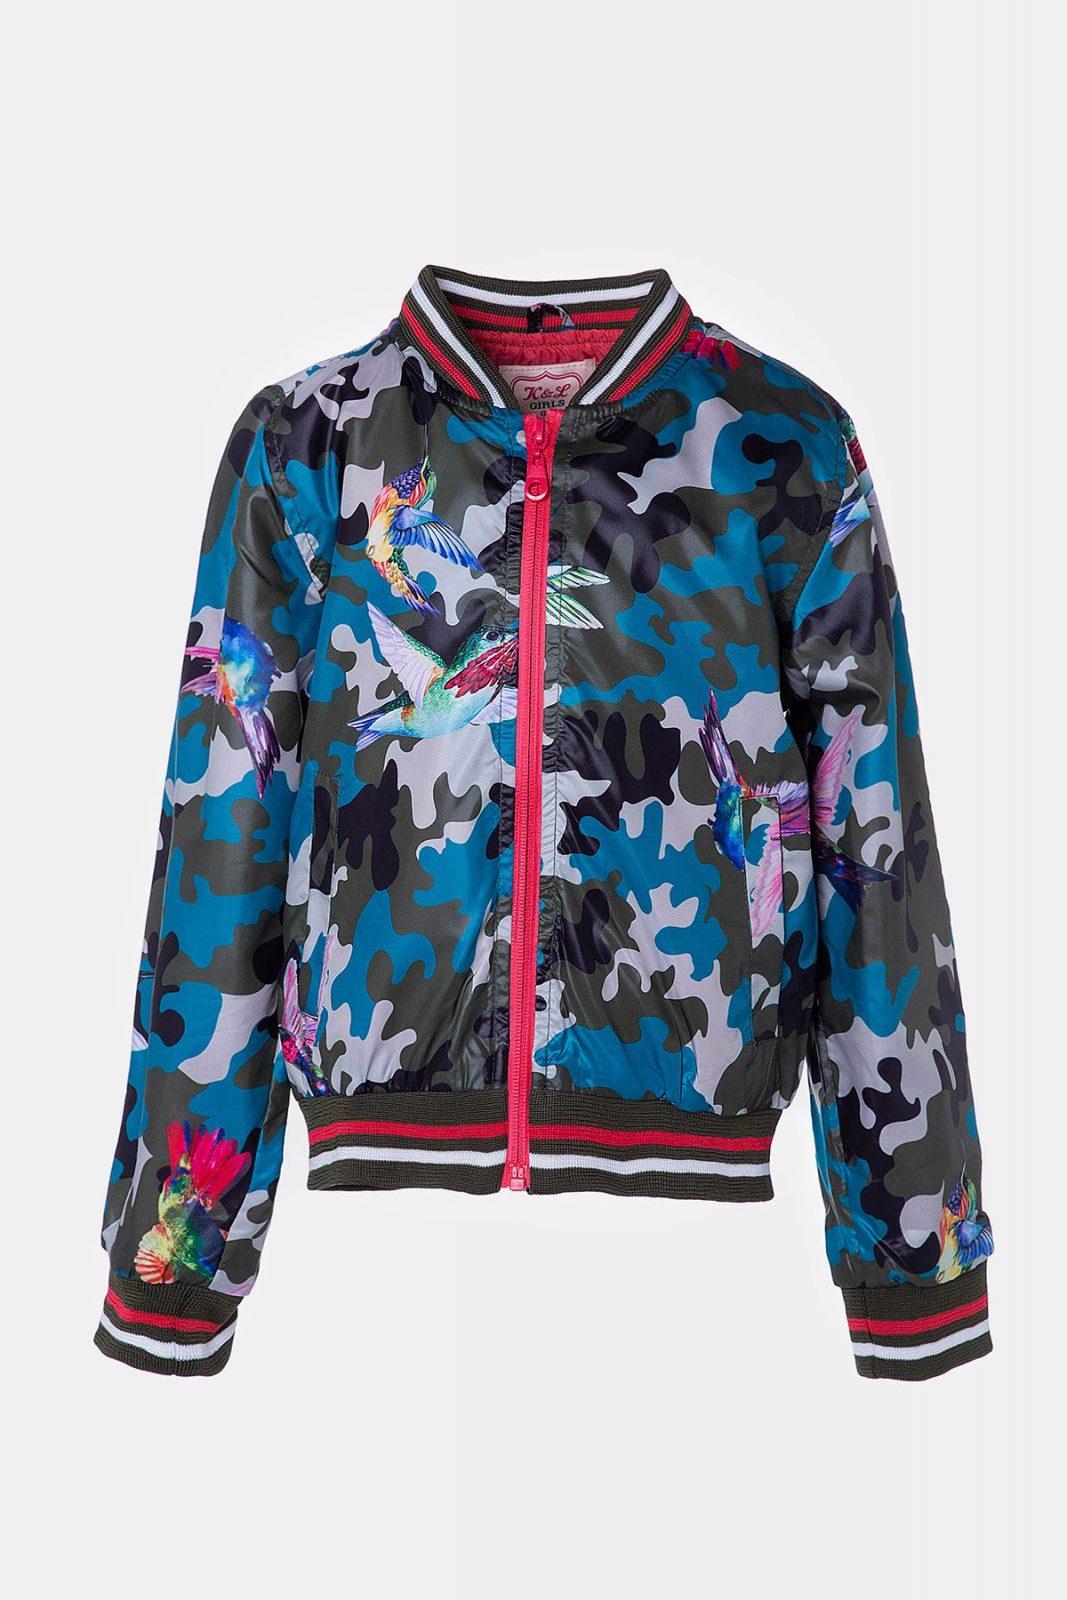 311e7550487 Μπουφάν αντιανεμικό για Κορίτσια - Ersas Παιδικά, Βρεφικά Ρούχα